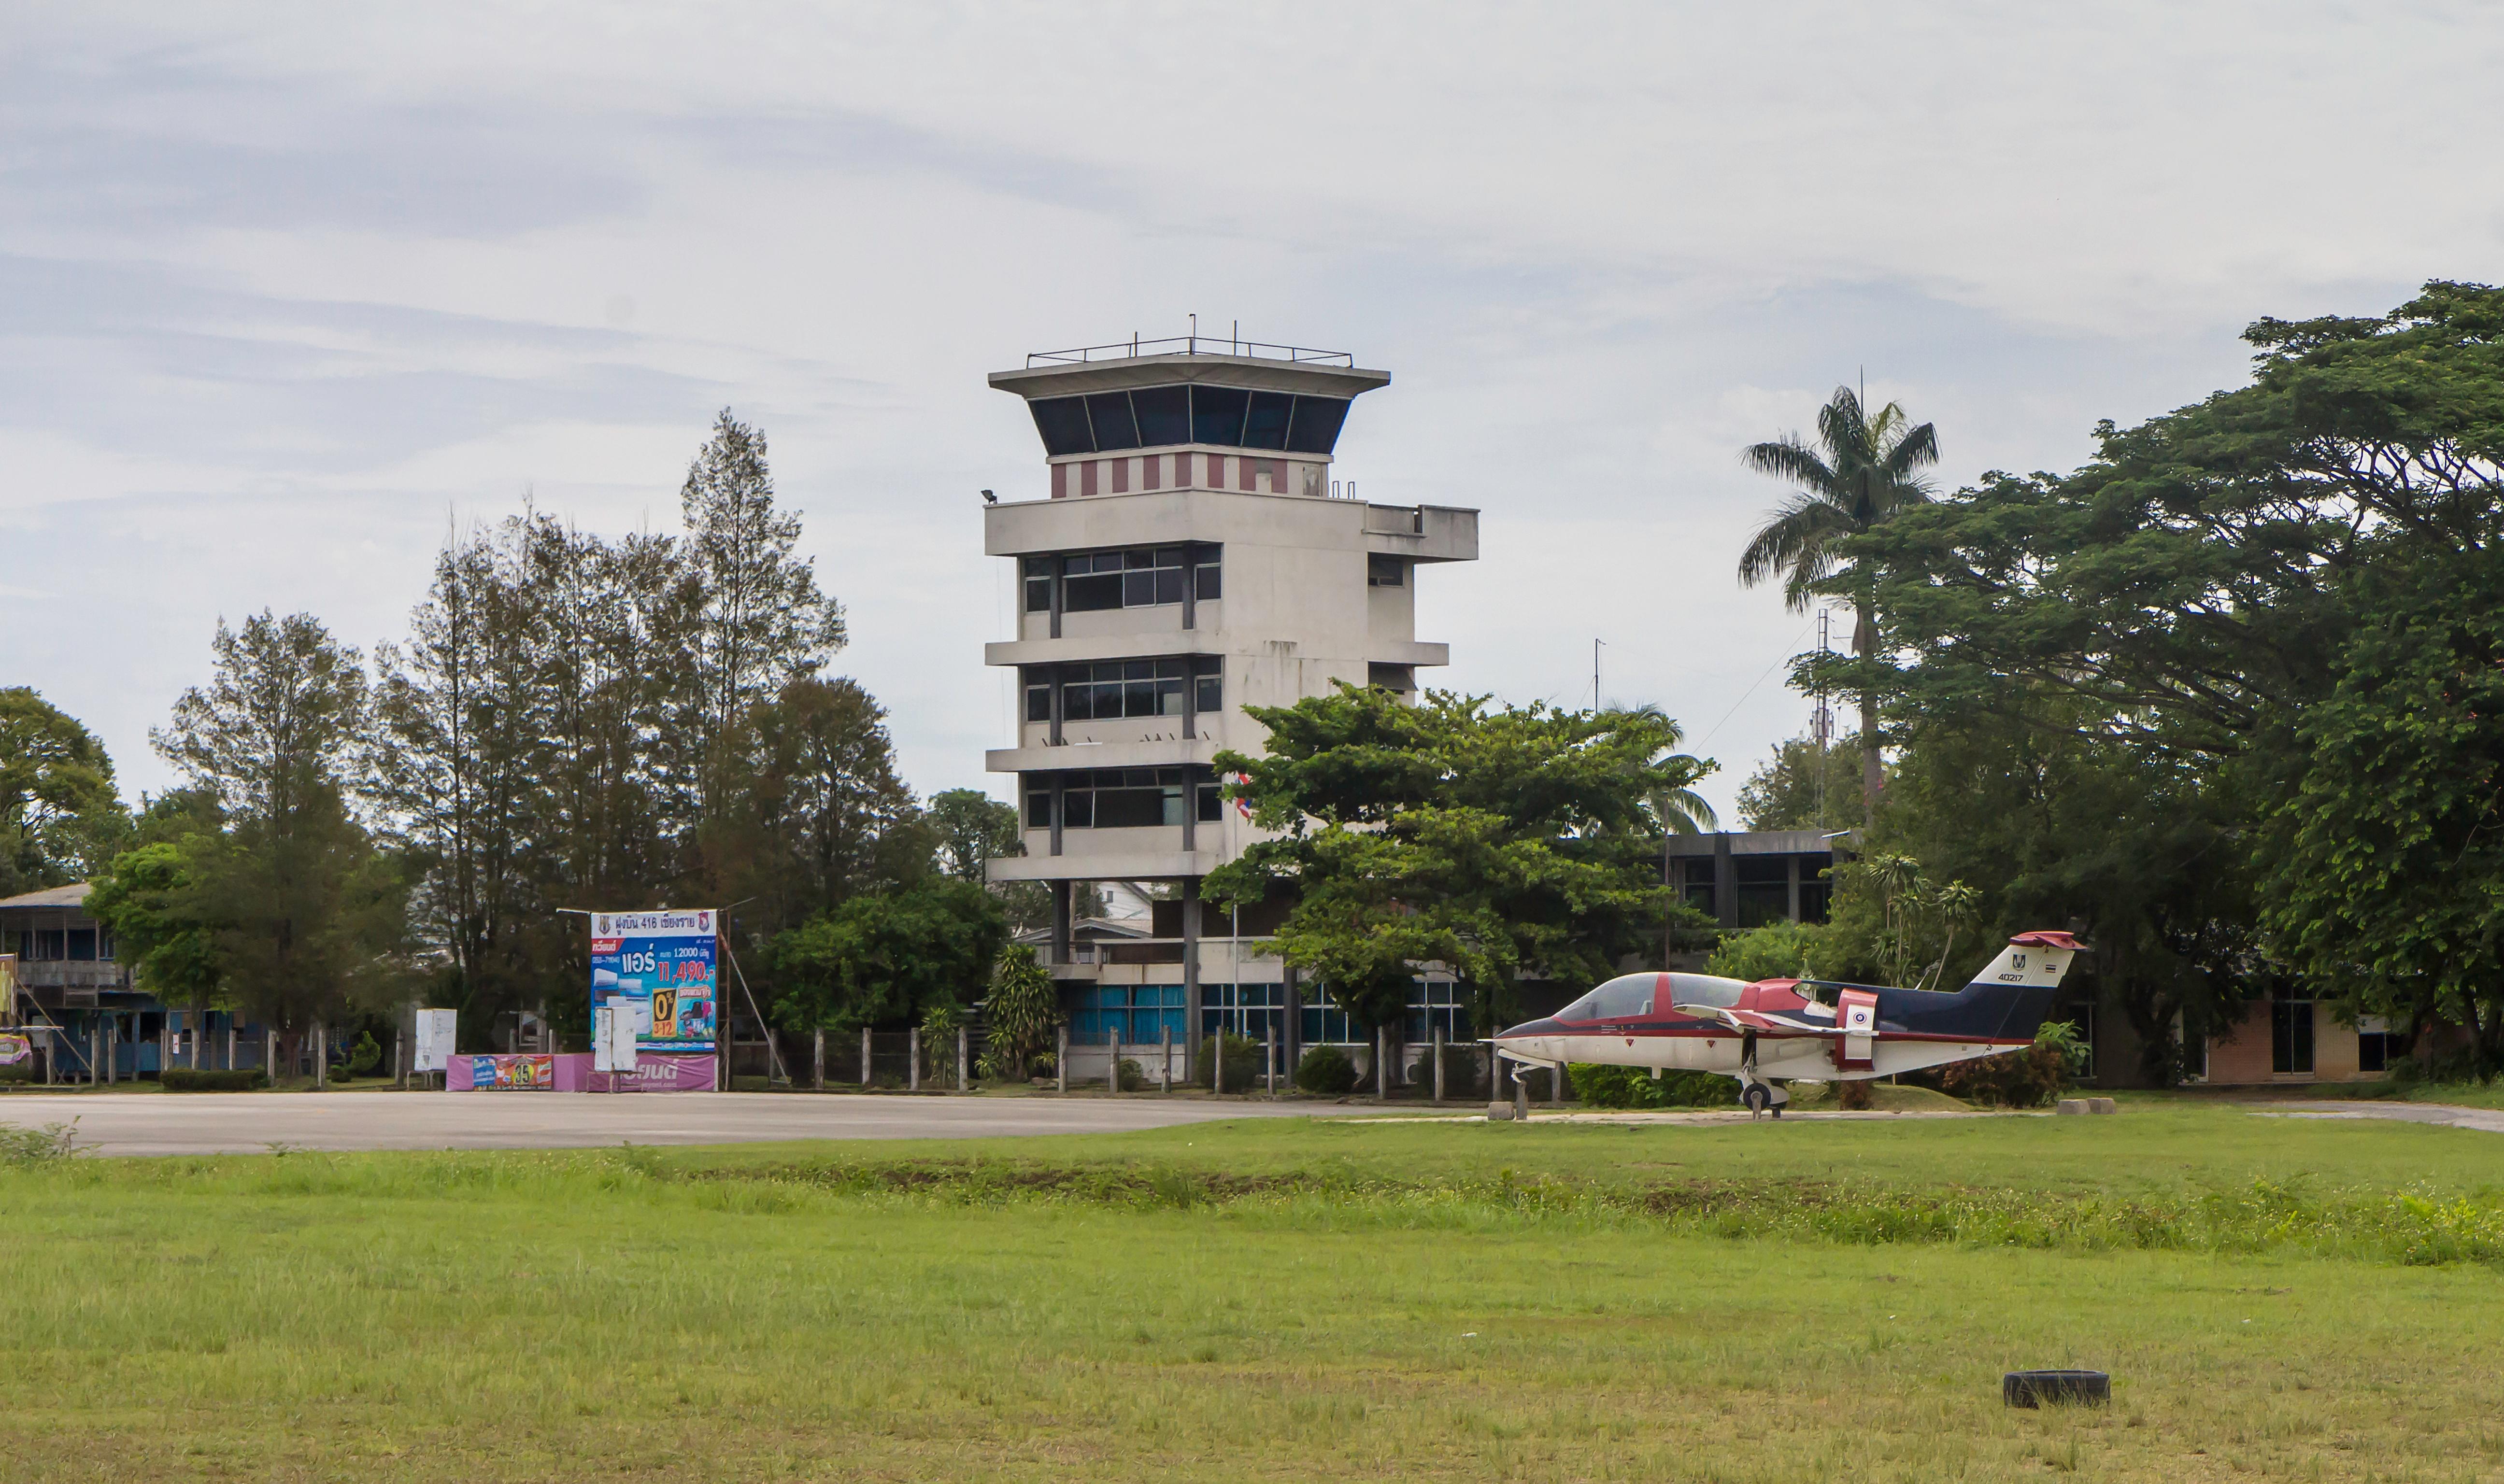 The_Old_Chiang_Rai_Airport.jpg